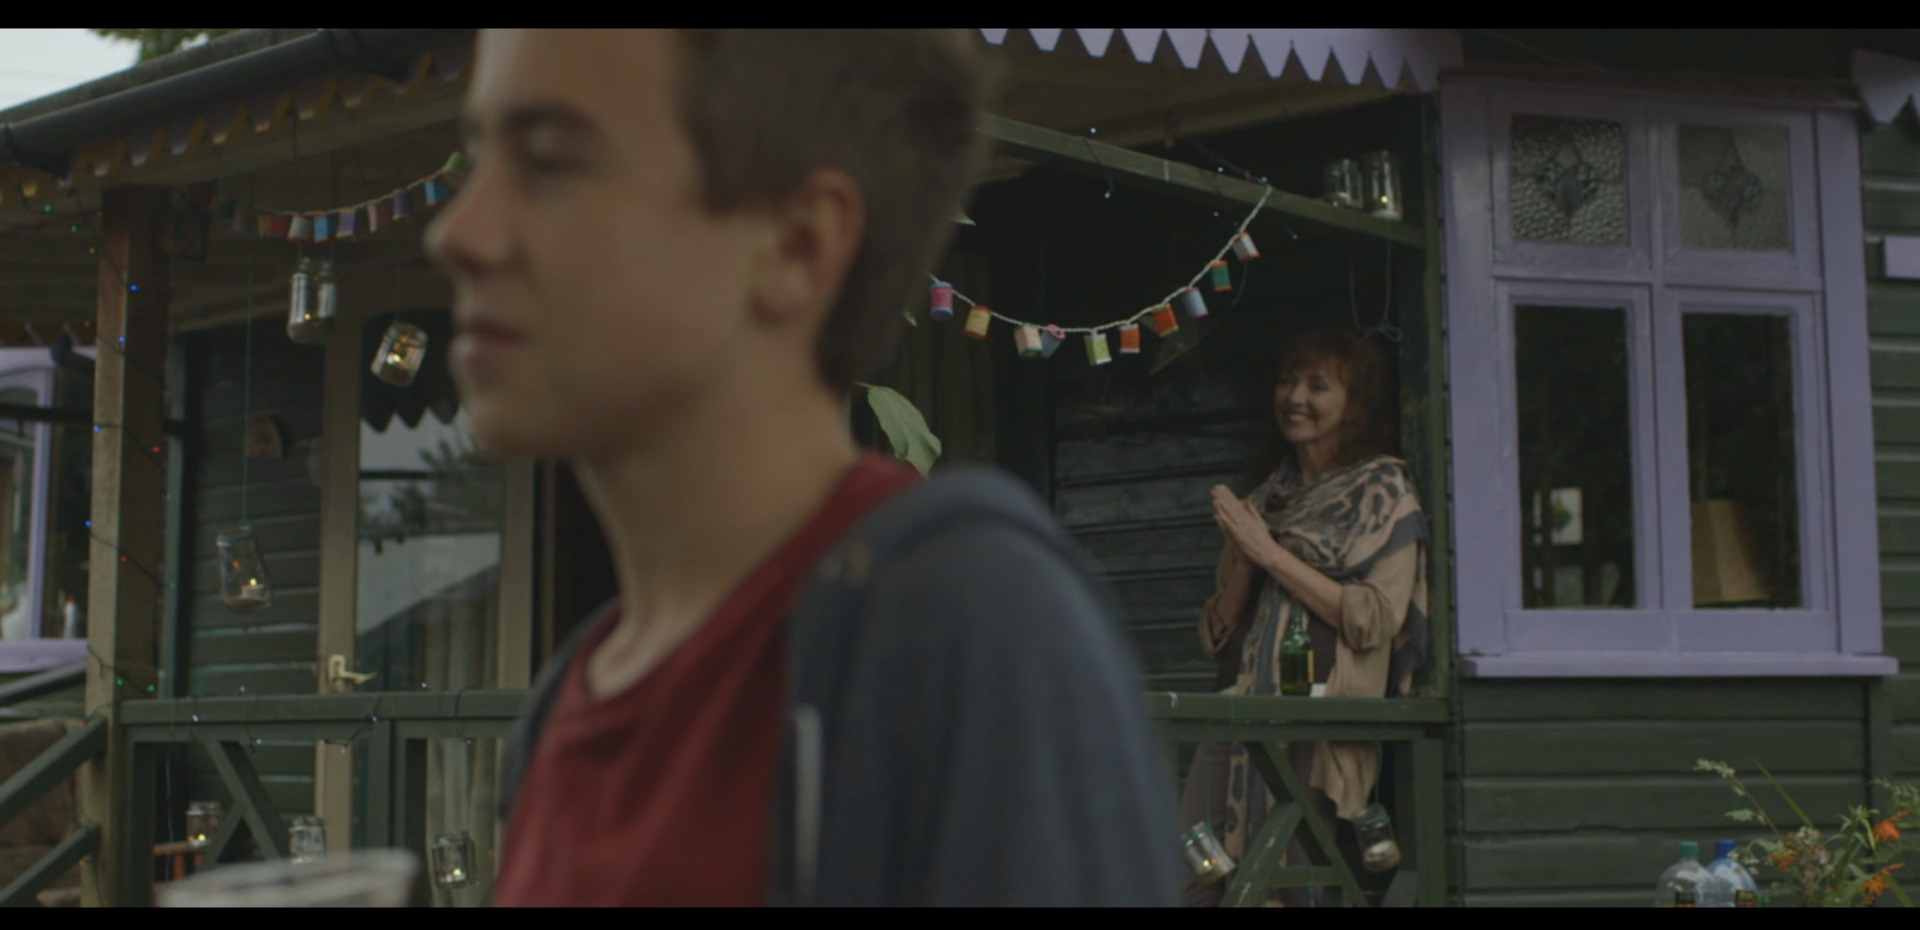 Sam Davies as Josh and Melanie Walters as Bethan in Long Arm Films' High Tide. ©Long Arm Films 2014